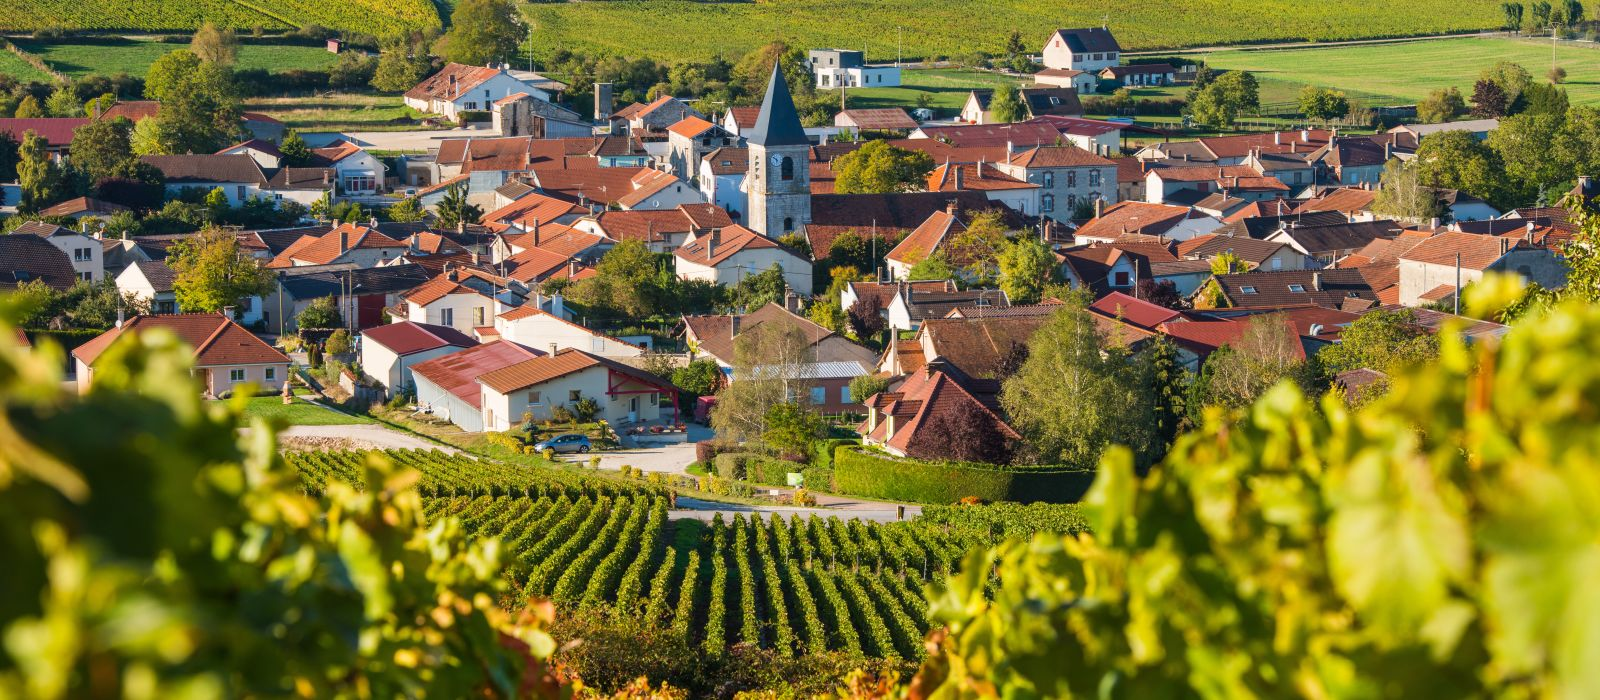 Destination Champagne Region France